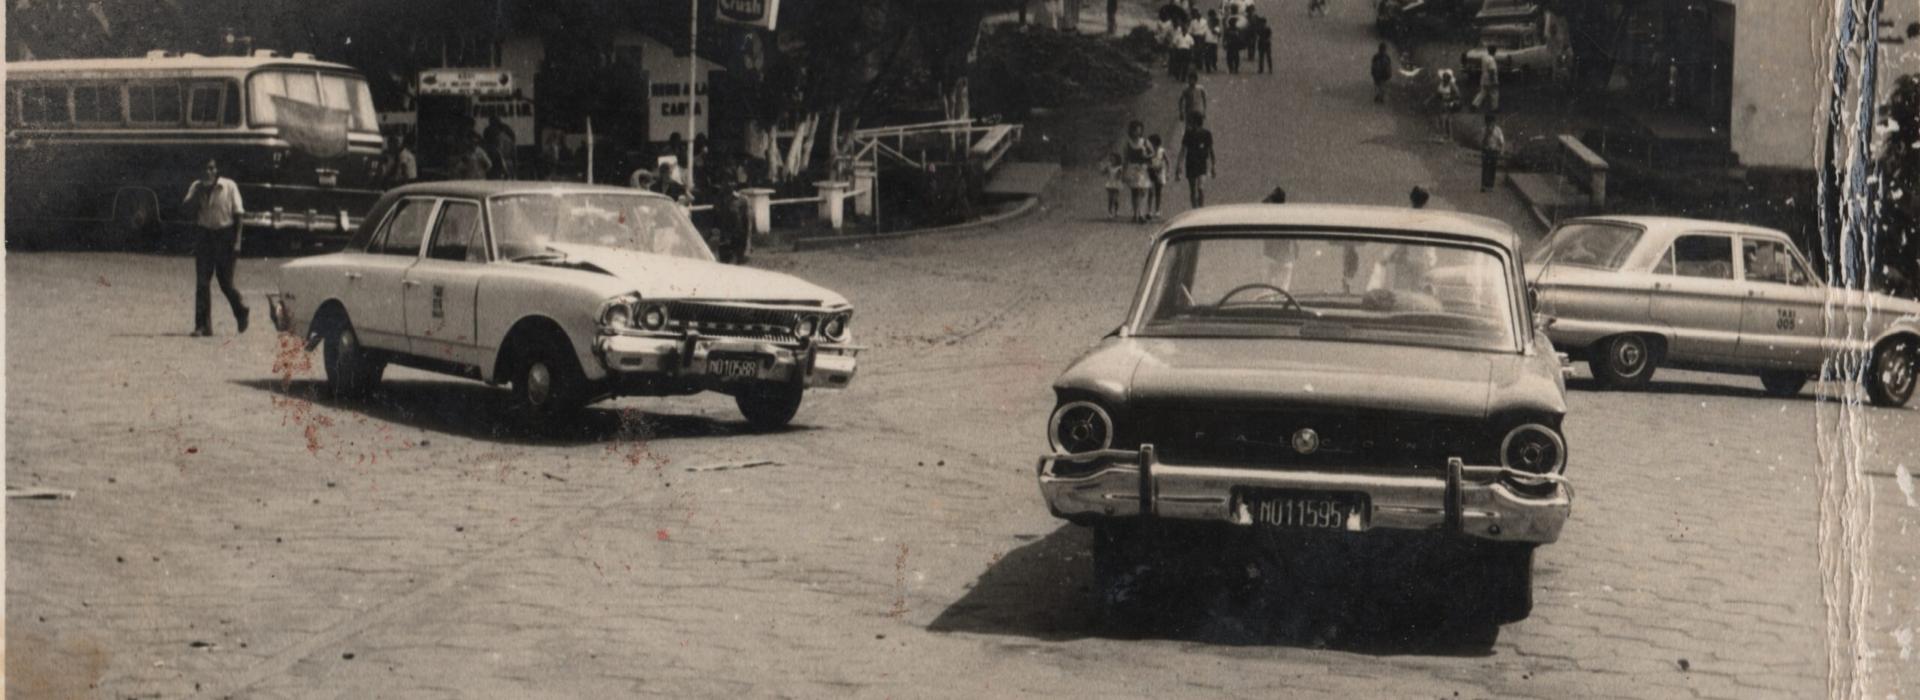 Año 1970, 7 bocas, Torino de Pedro Benítez(taxista). Se ve el comerdor de Arnulfo Arrieta.